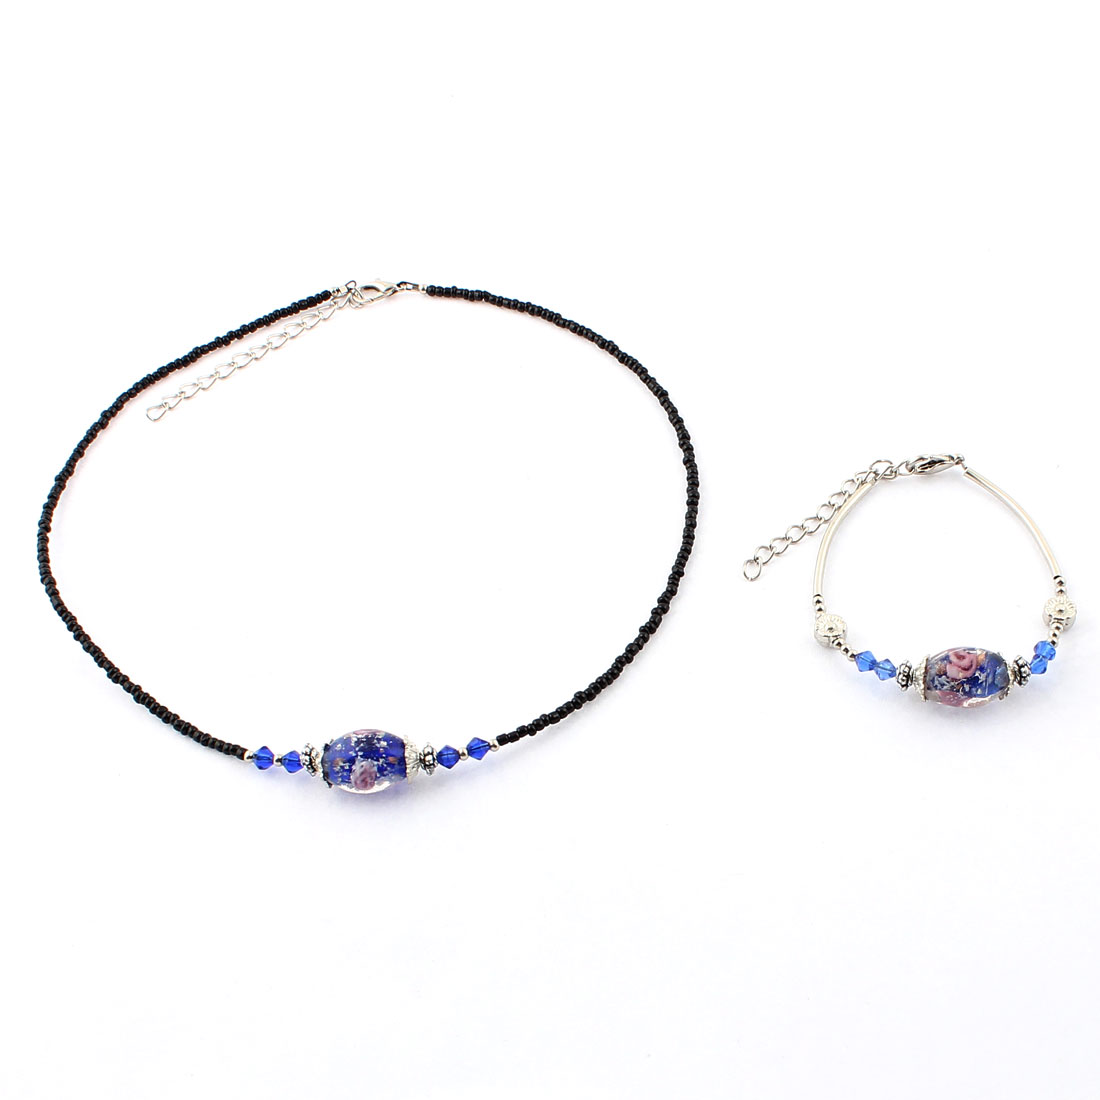 Woman Plastic Flower Pattern Bead Necklace Bracelet Dark Blue Set